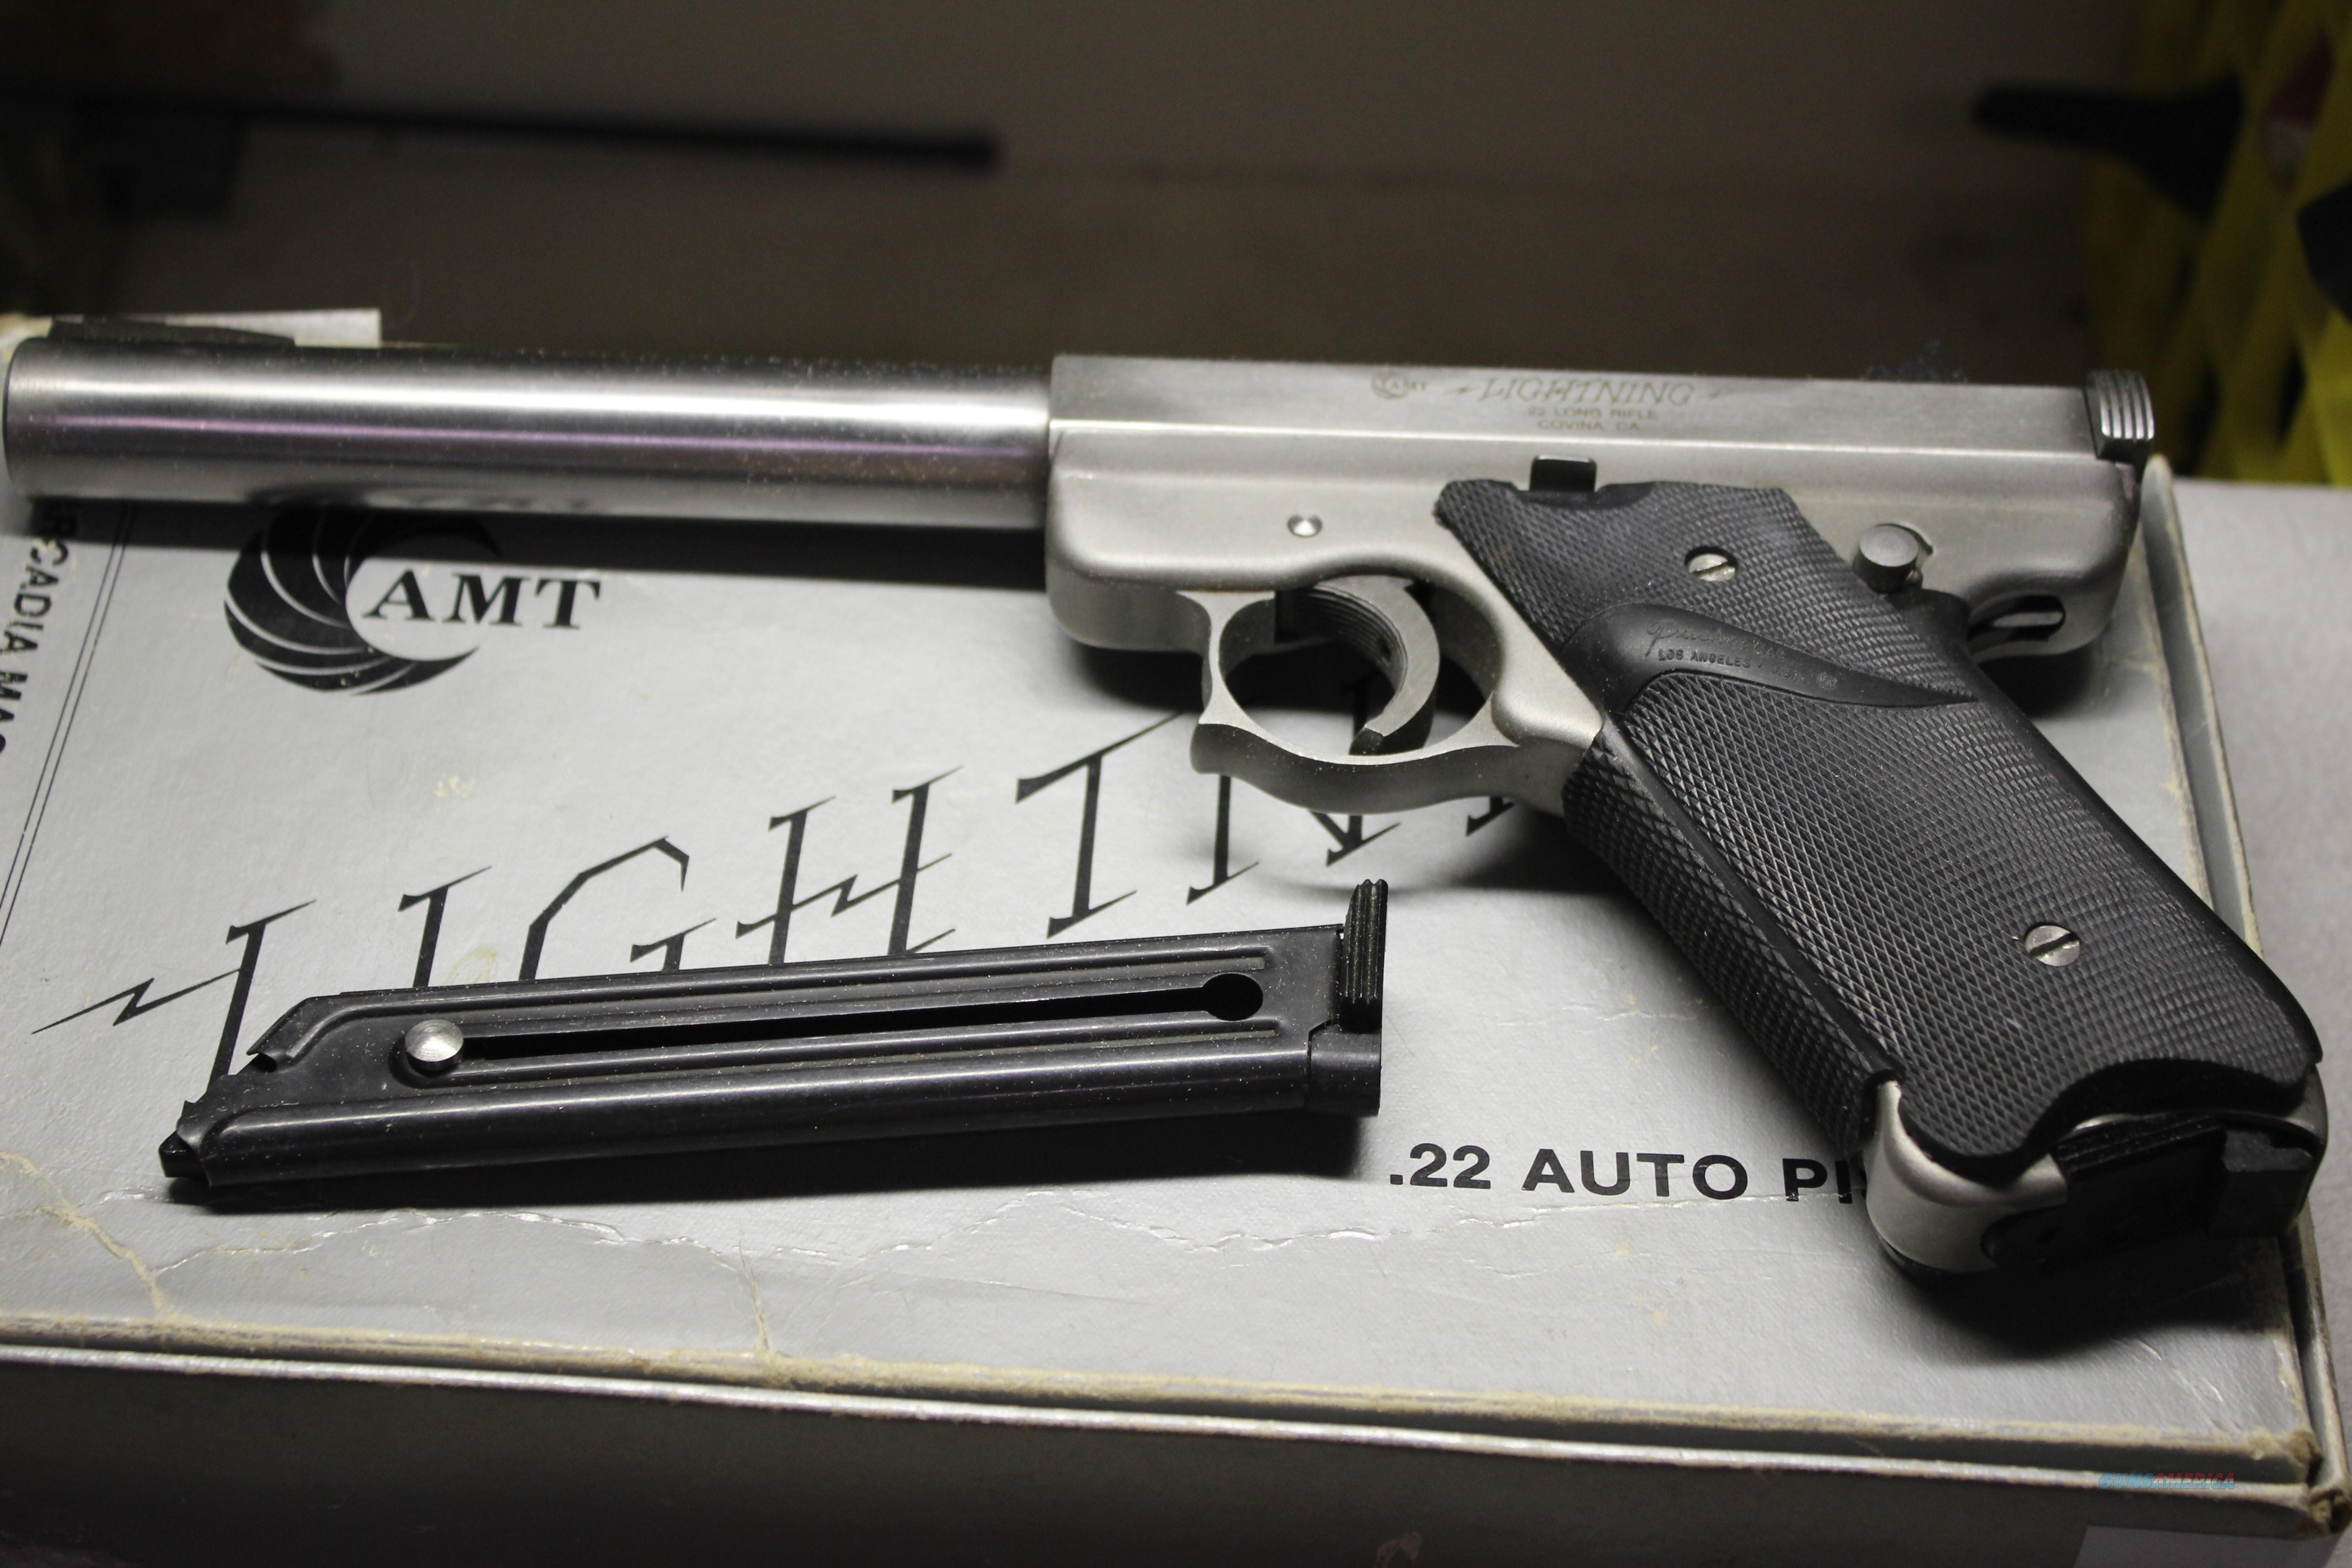 AMT LIGHTNING   Guns > Pistols > AMT Pistols > 1911 copies